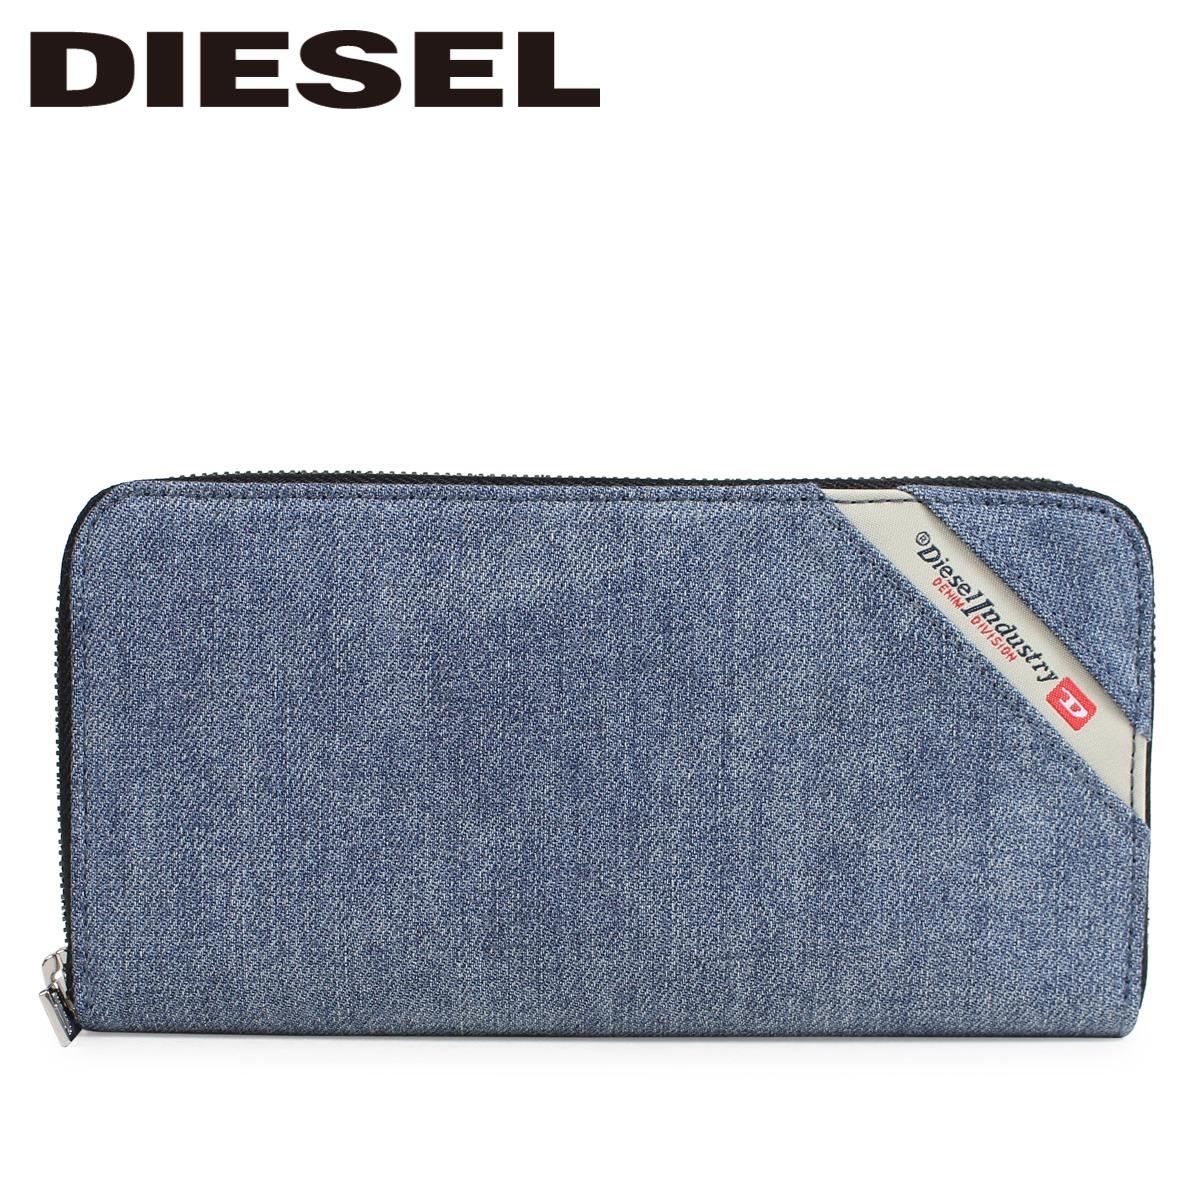 DIESEL 財布 ディーゼル メンズ 長財布 ラウンドファスナー DENIMLINE 24 ZIP ブルー X05271 PS778